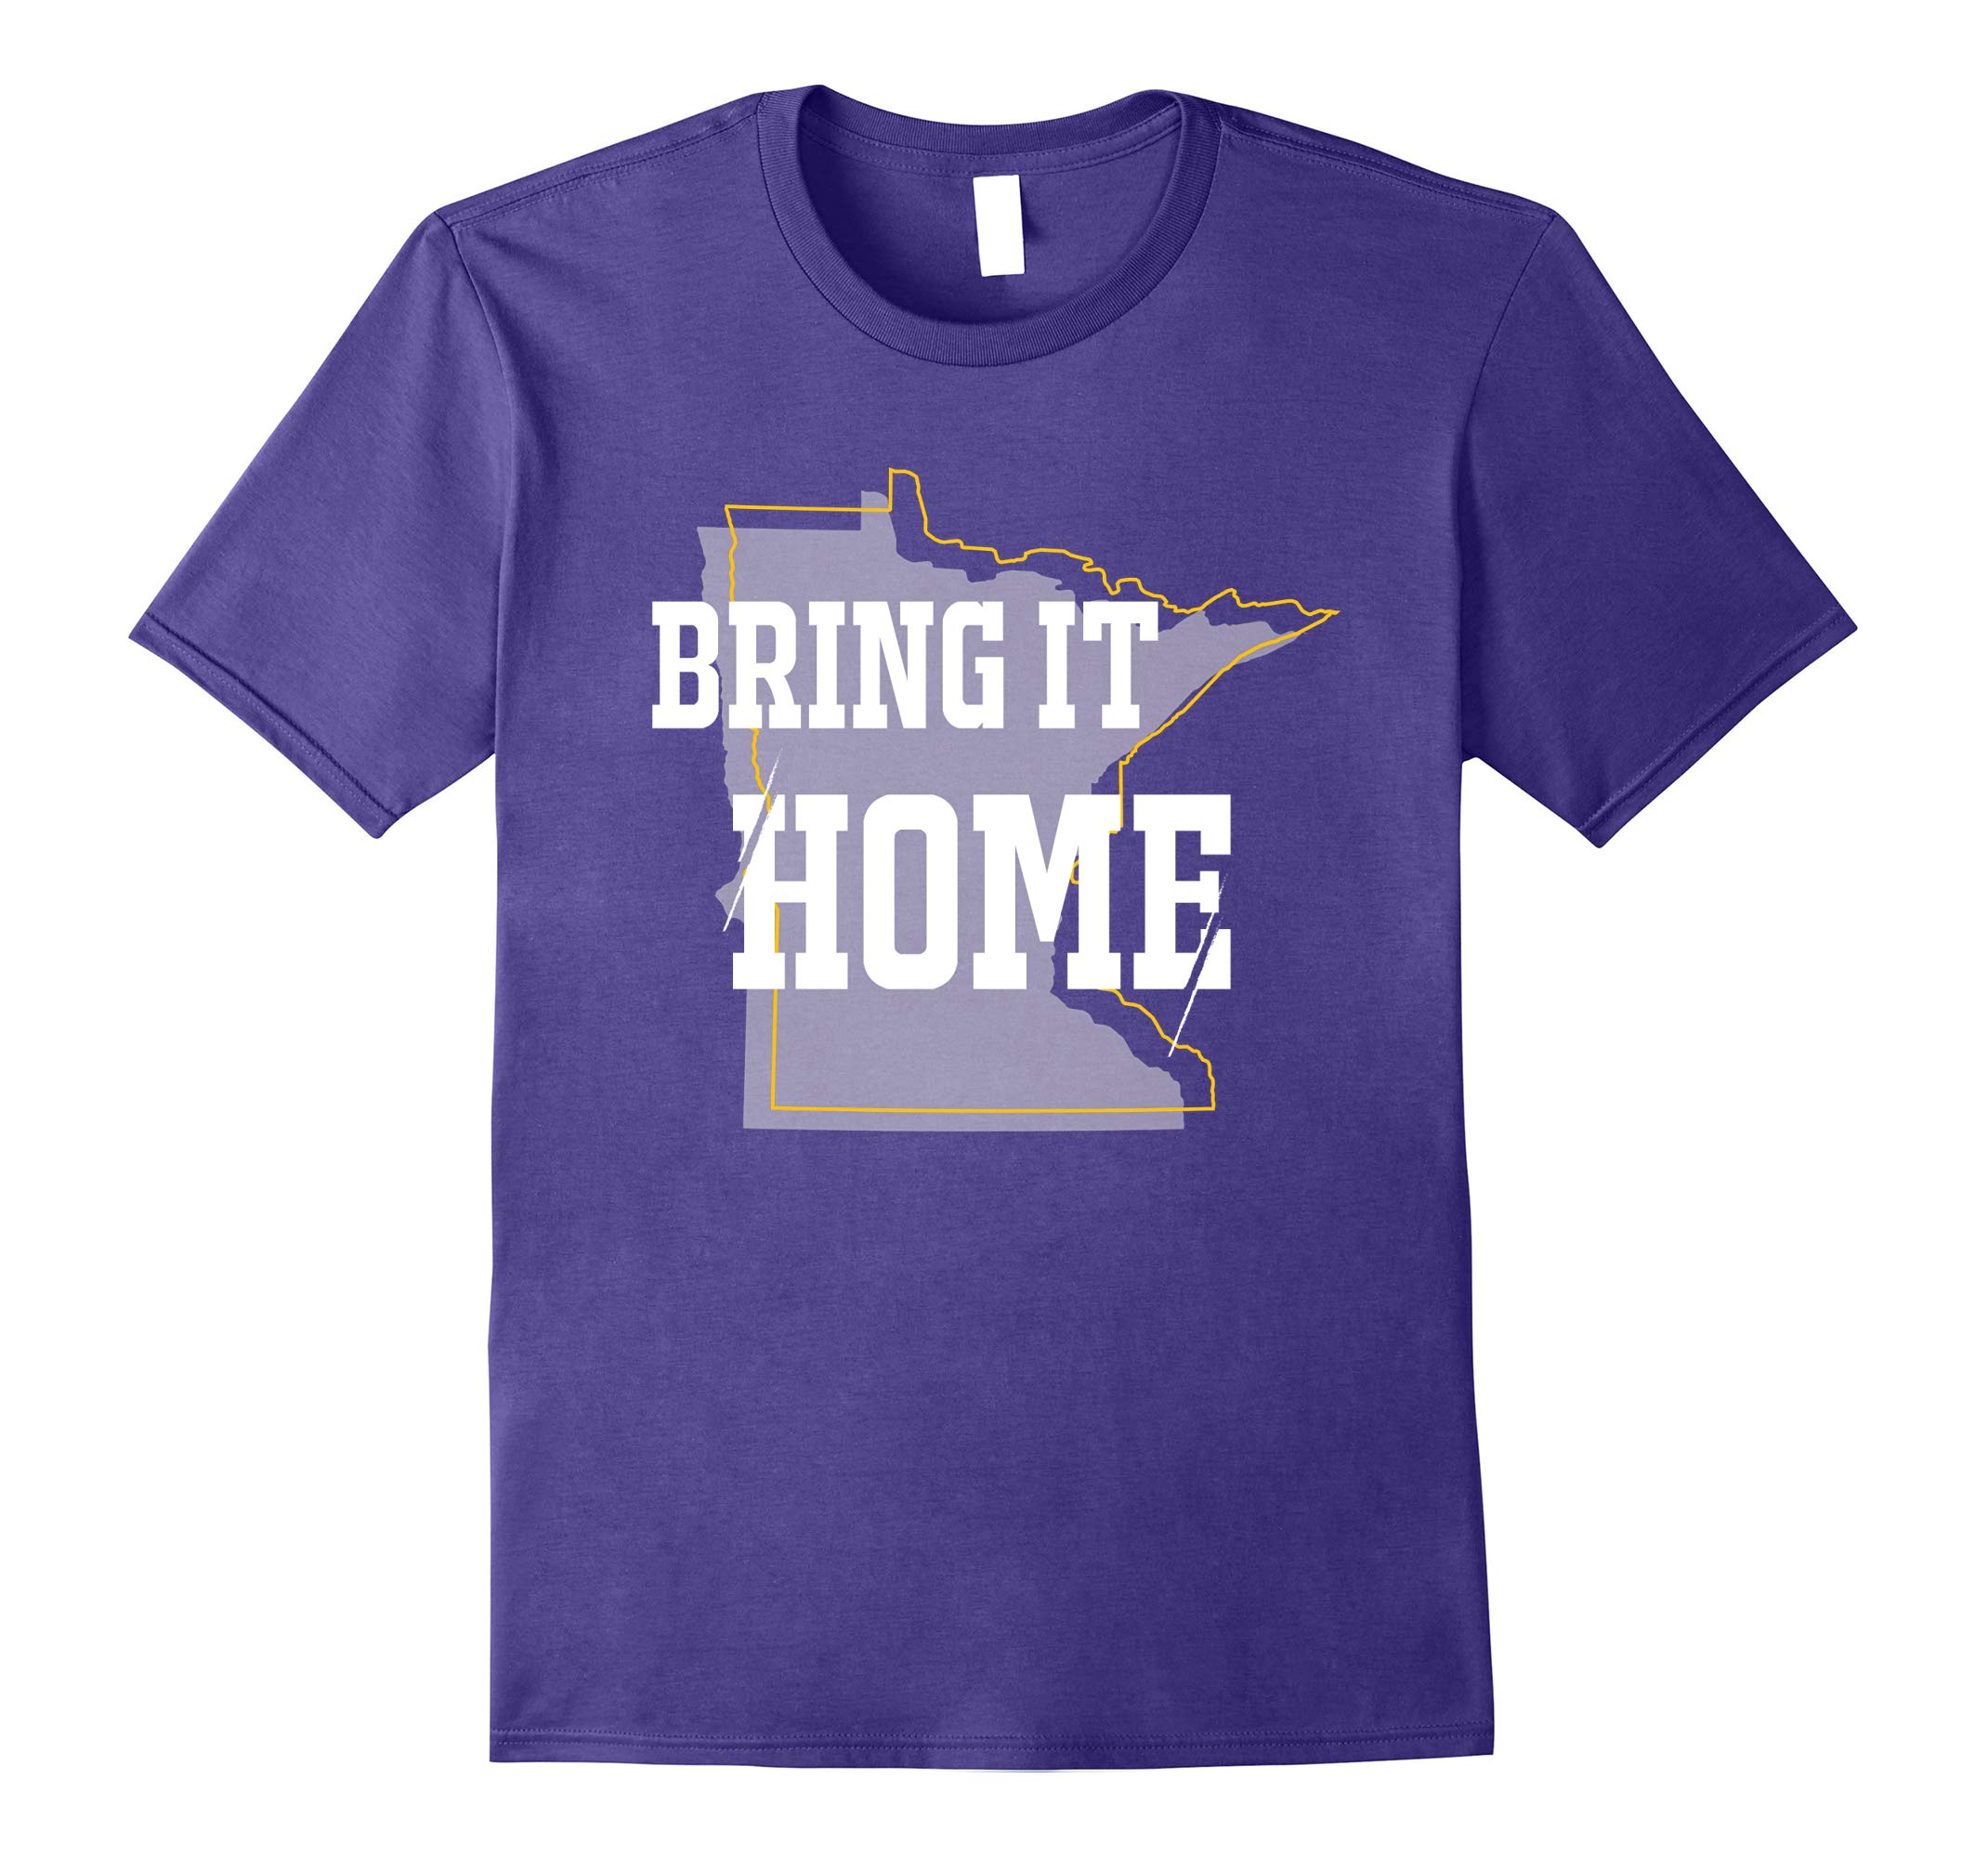 Bring it Home Minneapolis Miracle T Shirt 29 - 24 Score Tee-RT